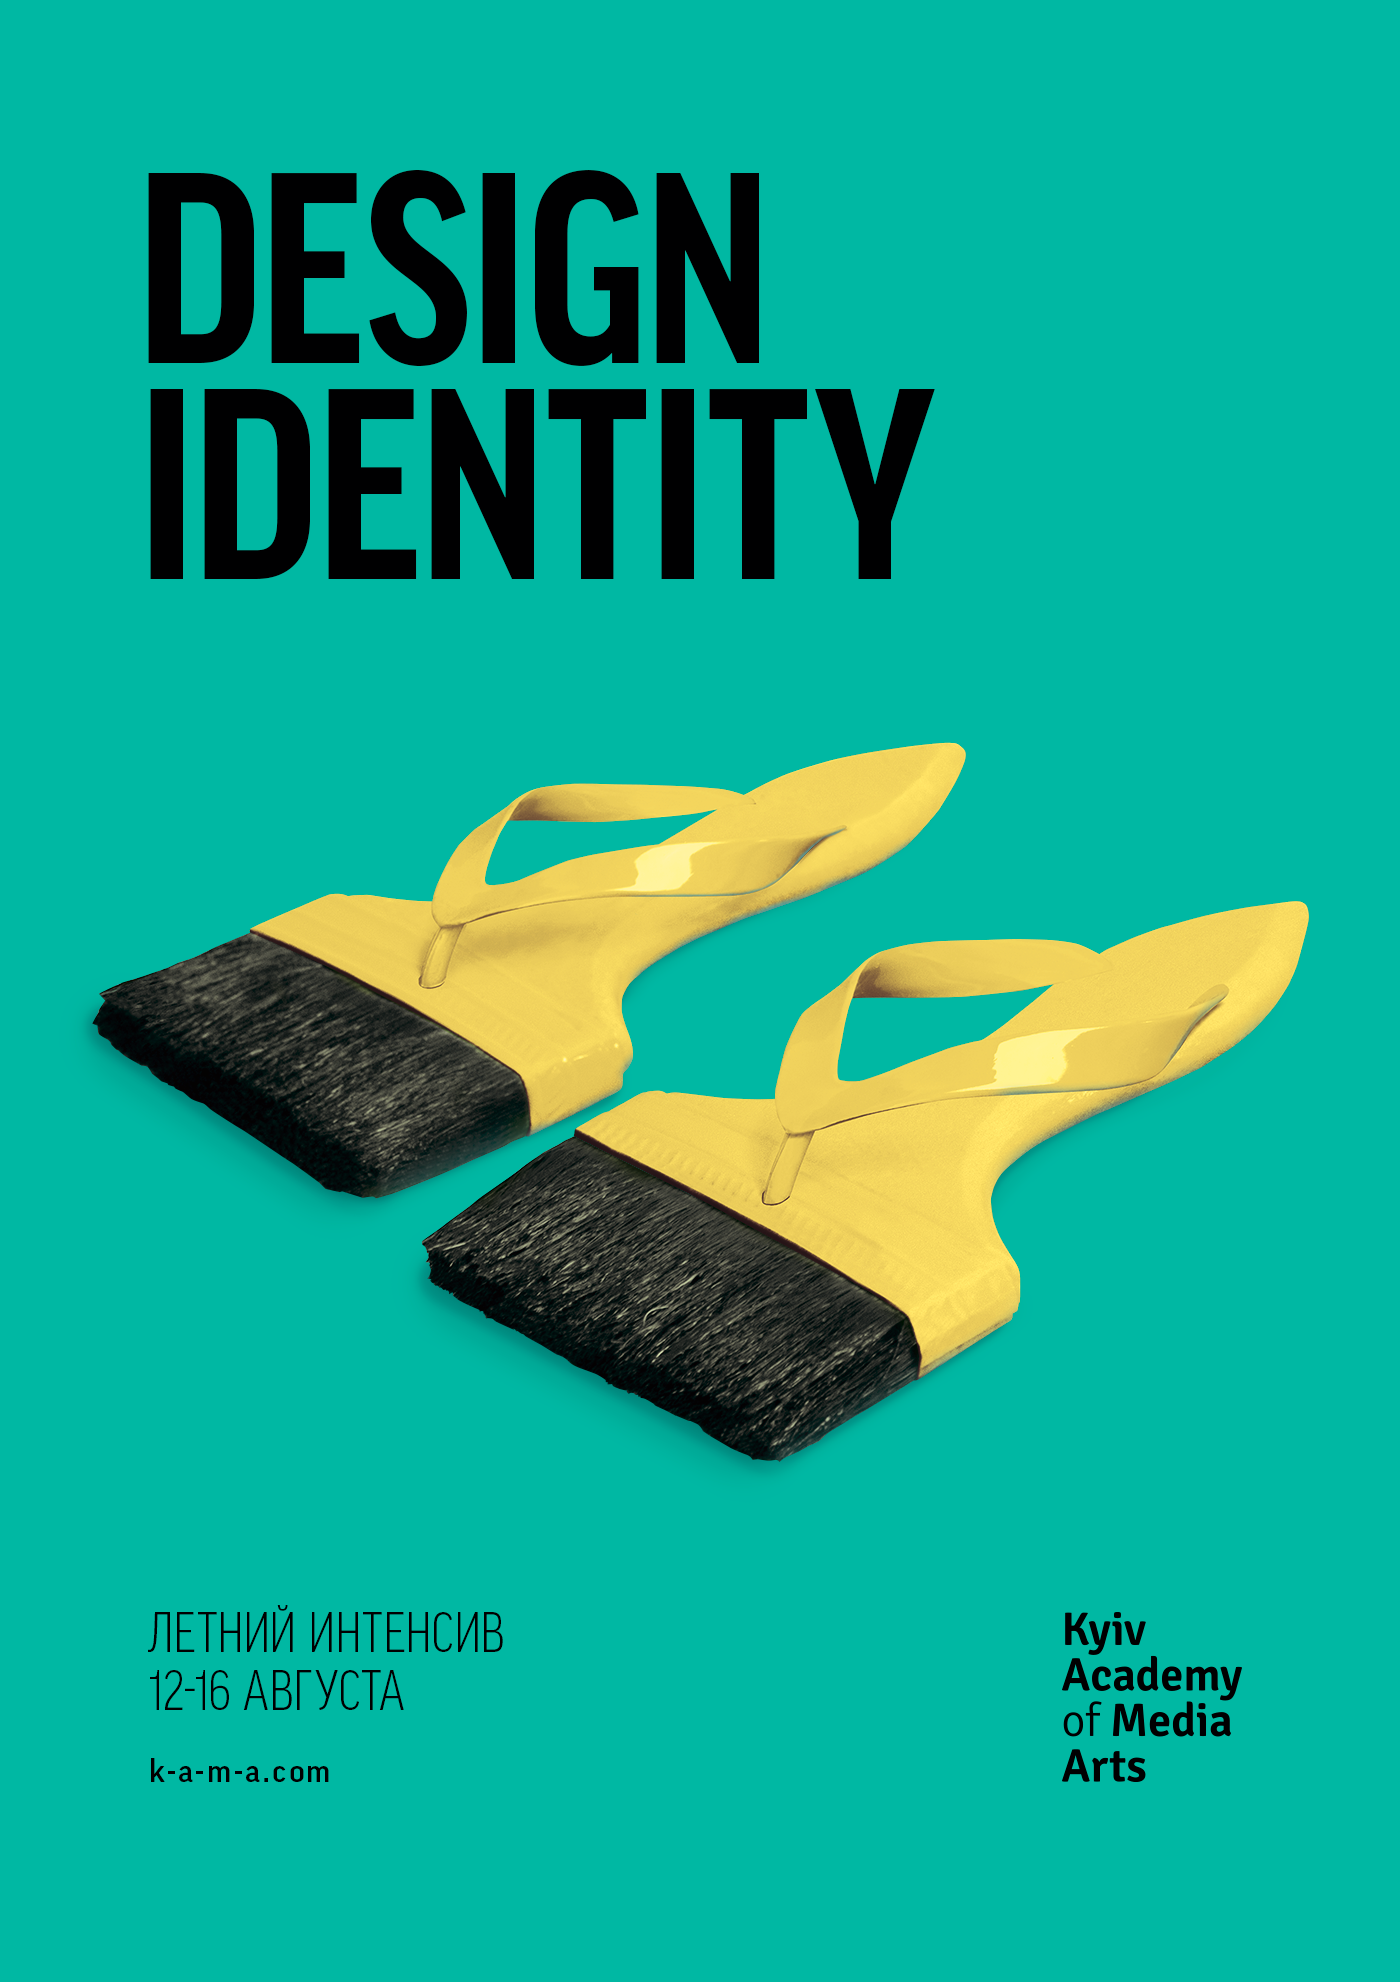 DESIGN-IDENTITY-WEB (1).png